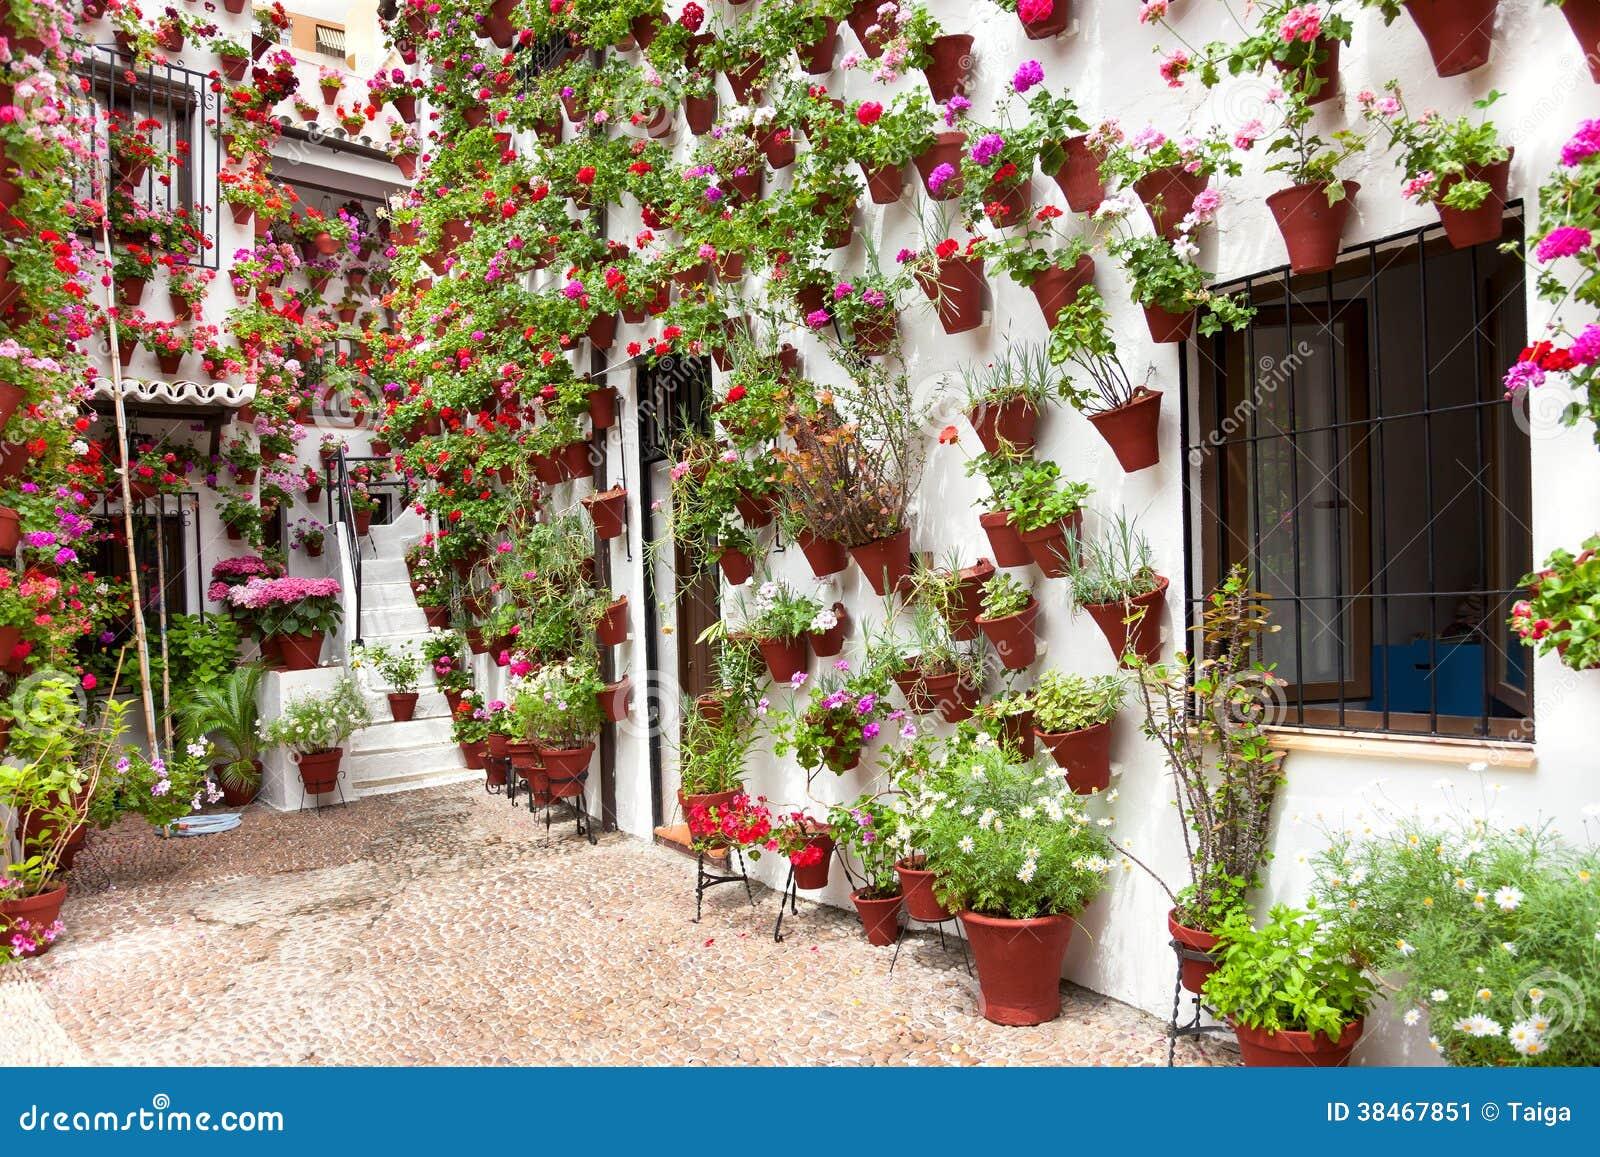 Spring flowers decoration of old house patio cordoba for Decoracion original